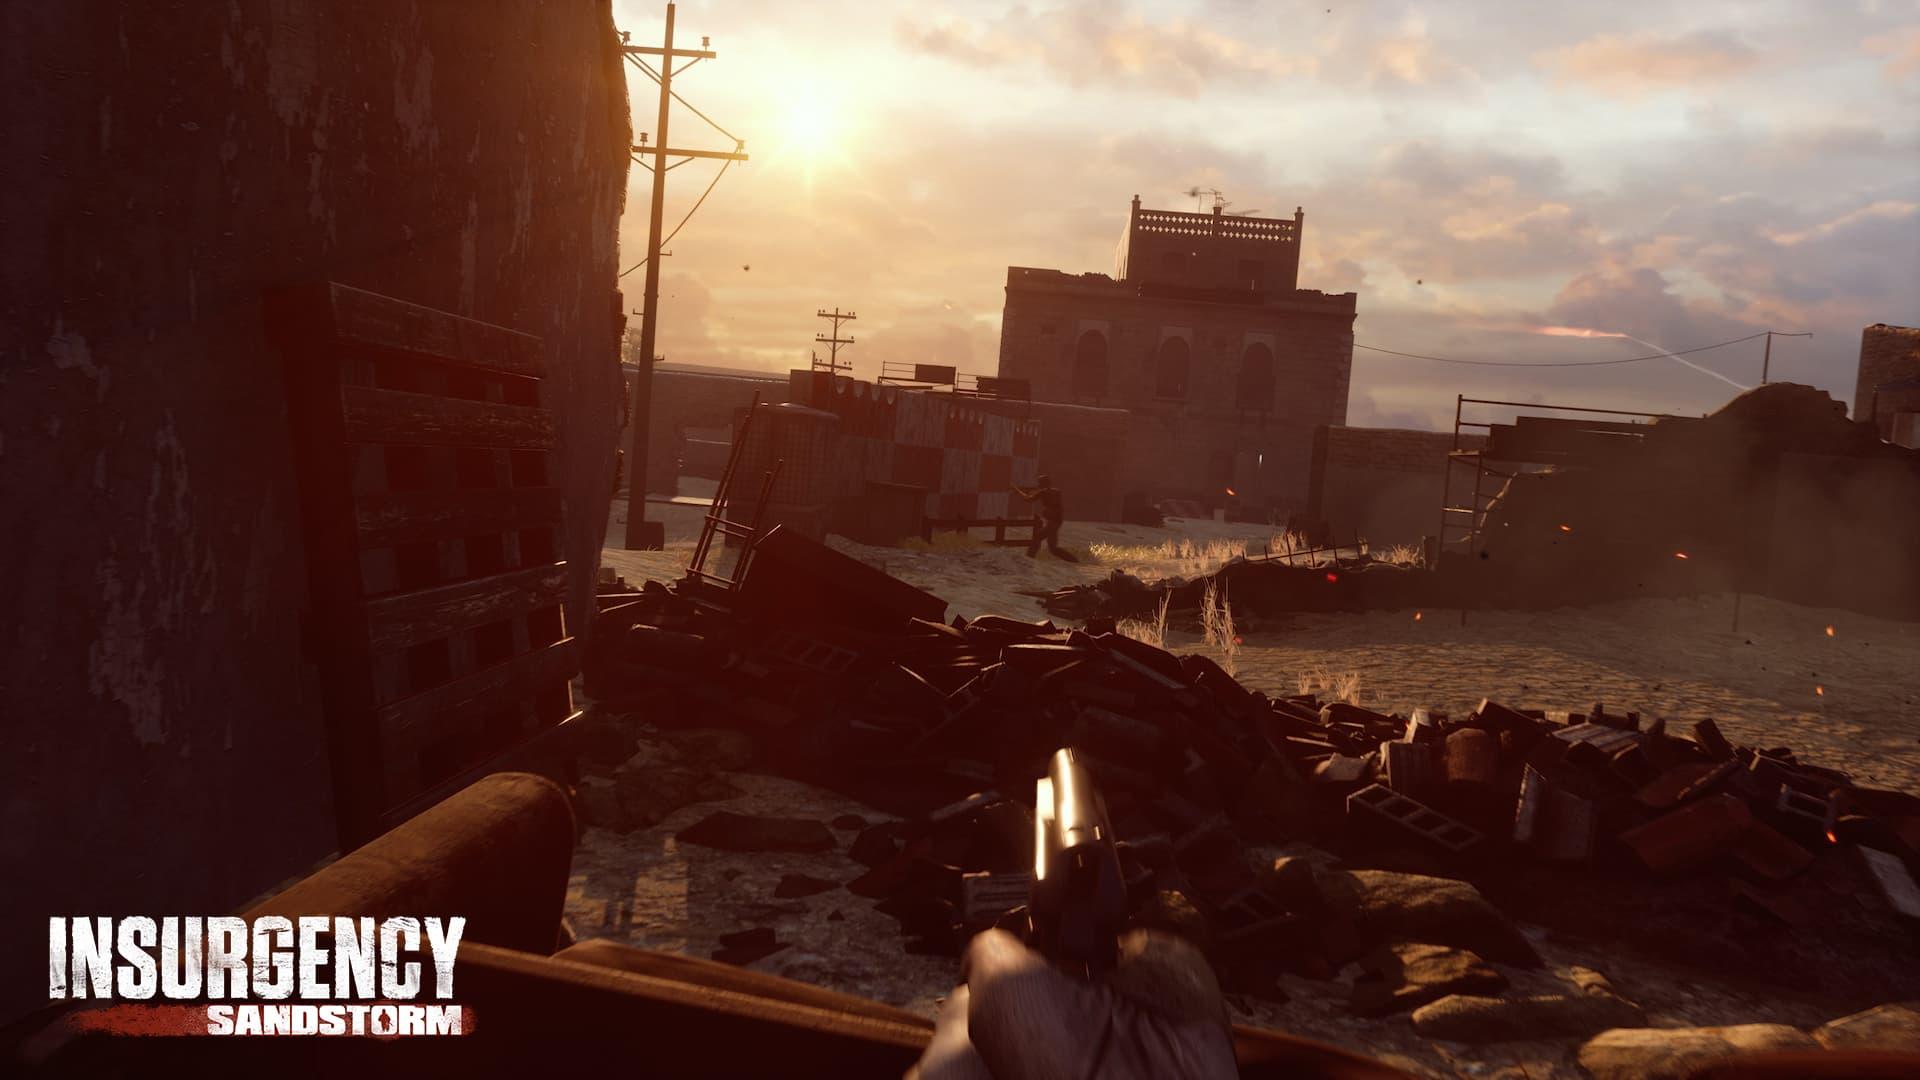 Xbox Series X & S Insurgency: Sandstorm